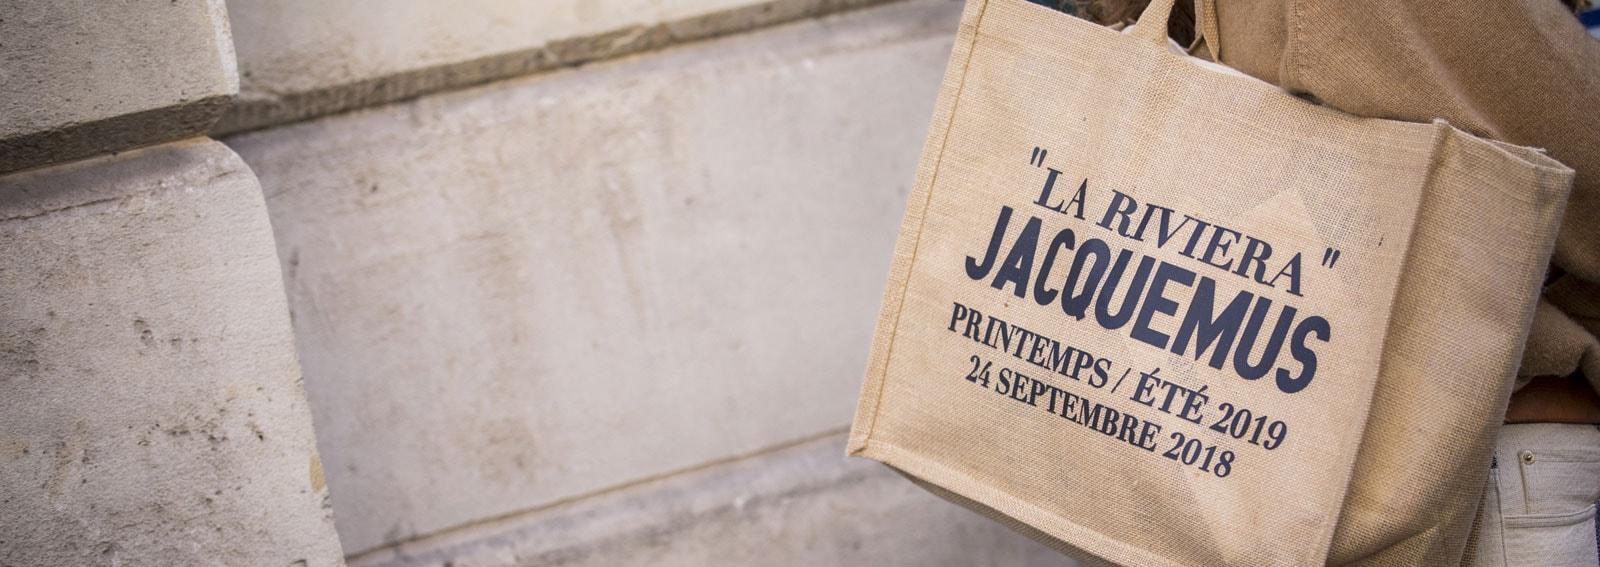 jacquemus-cover-DESK